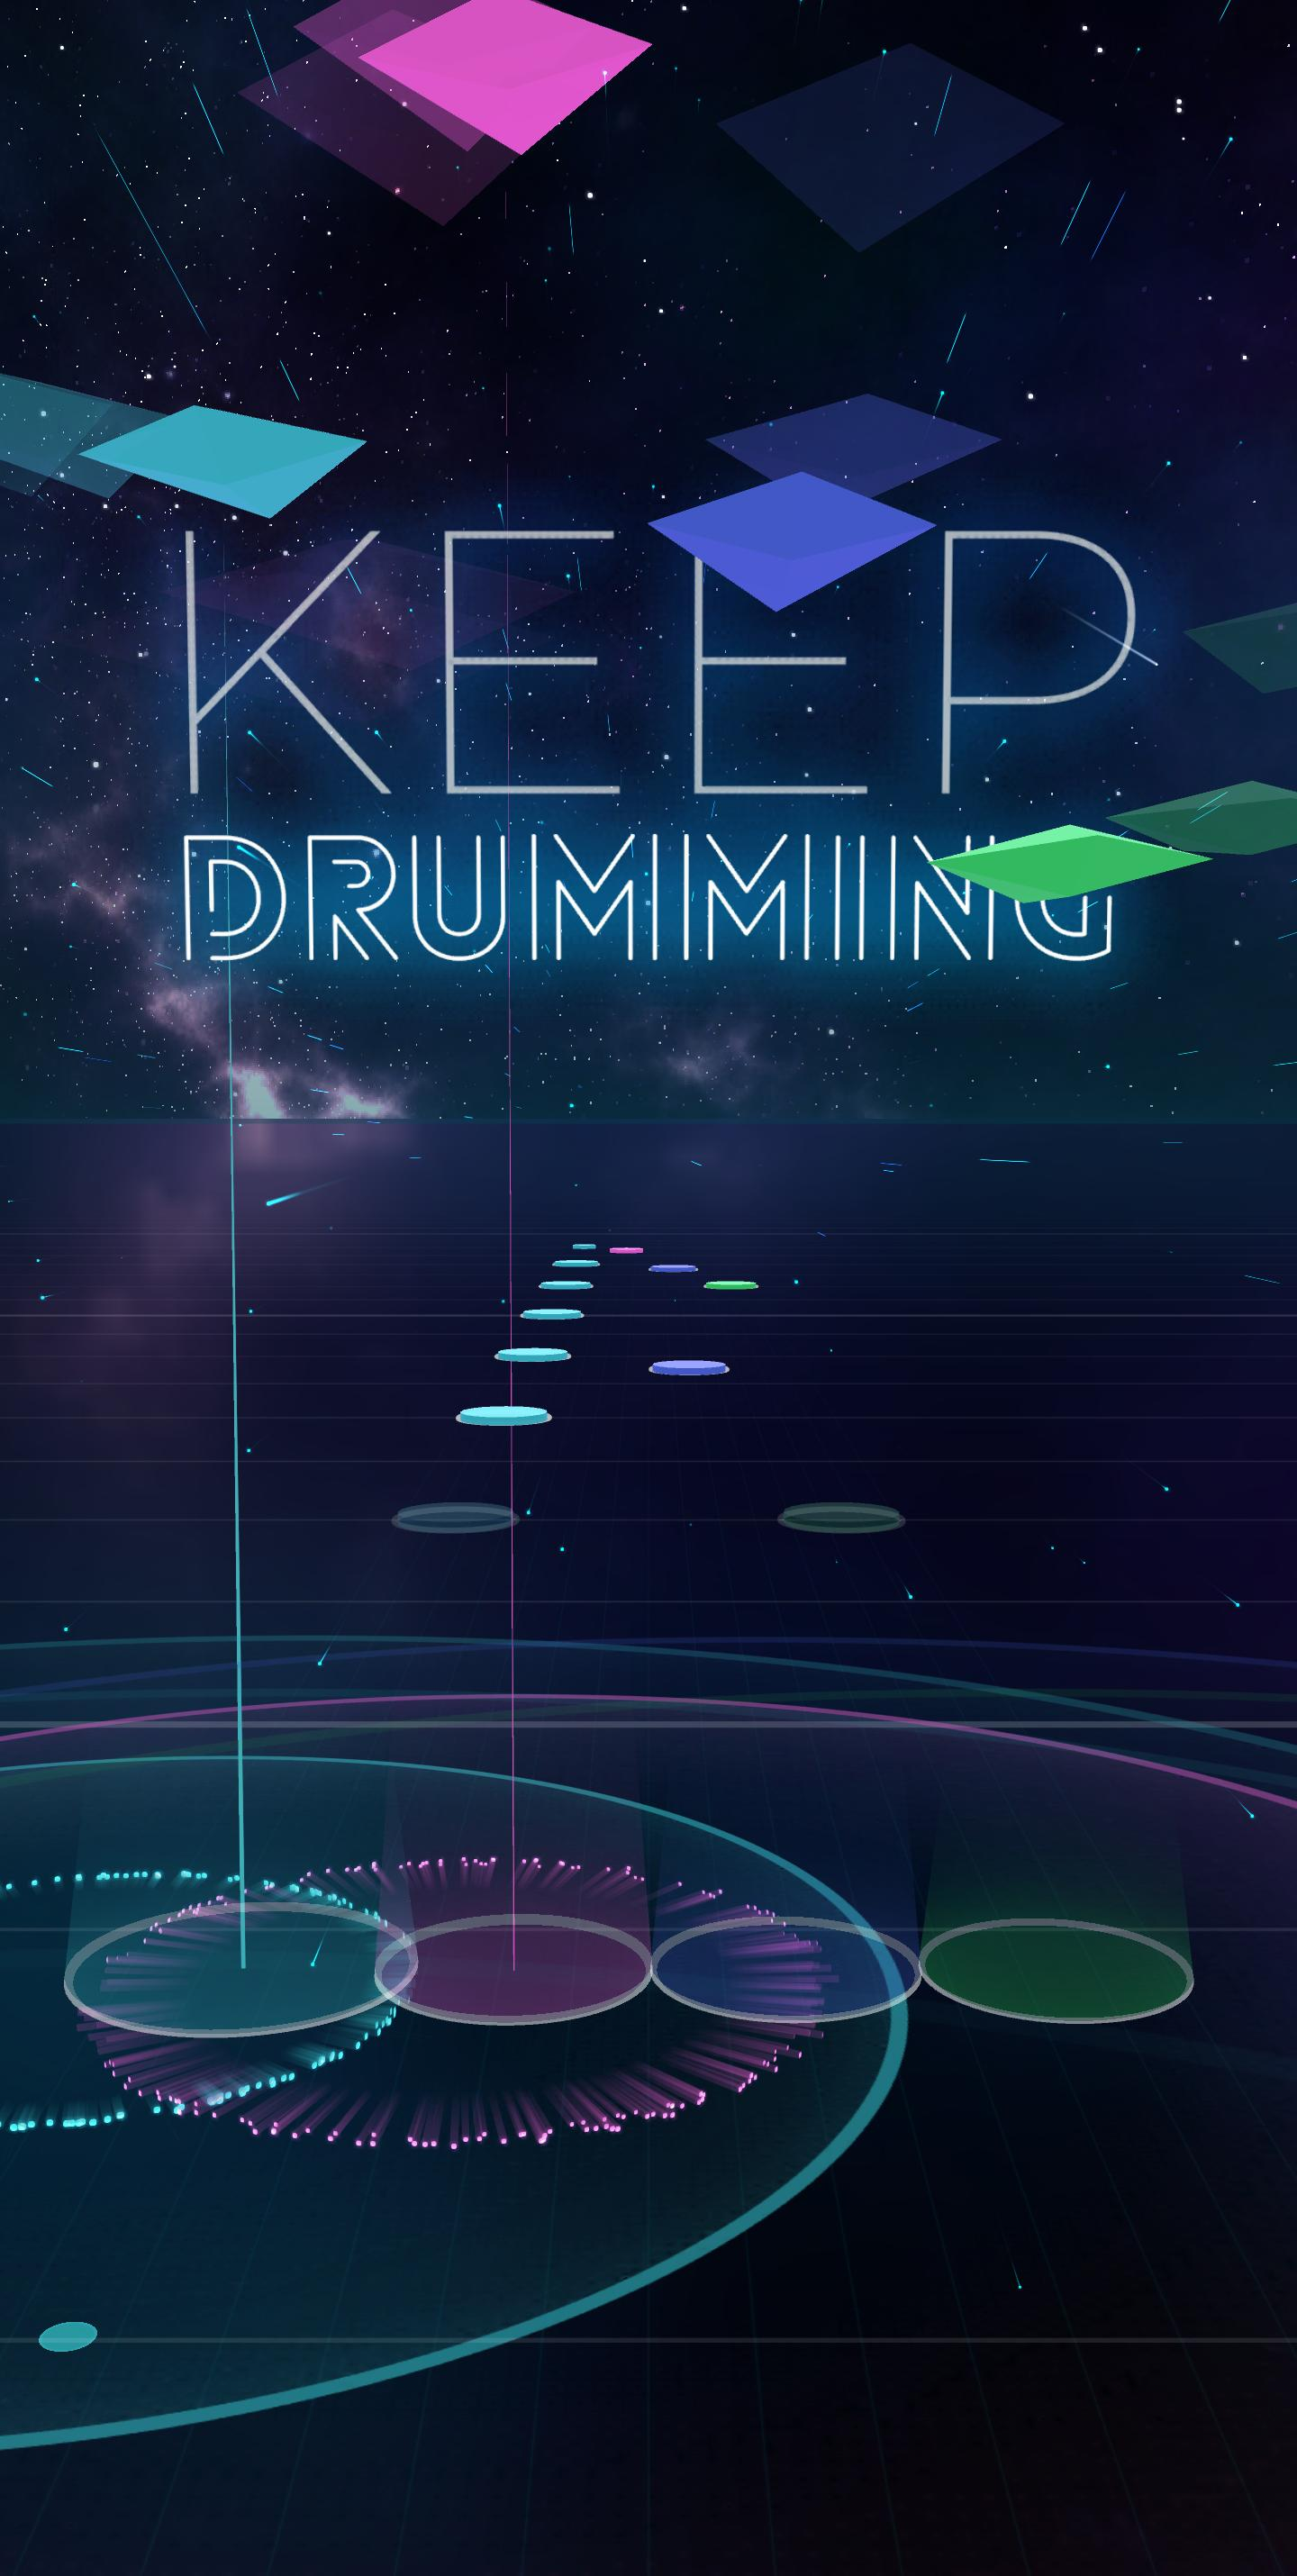 Sound Sky — Keep Calm, Drum On 1.7.3 Screenshot 2